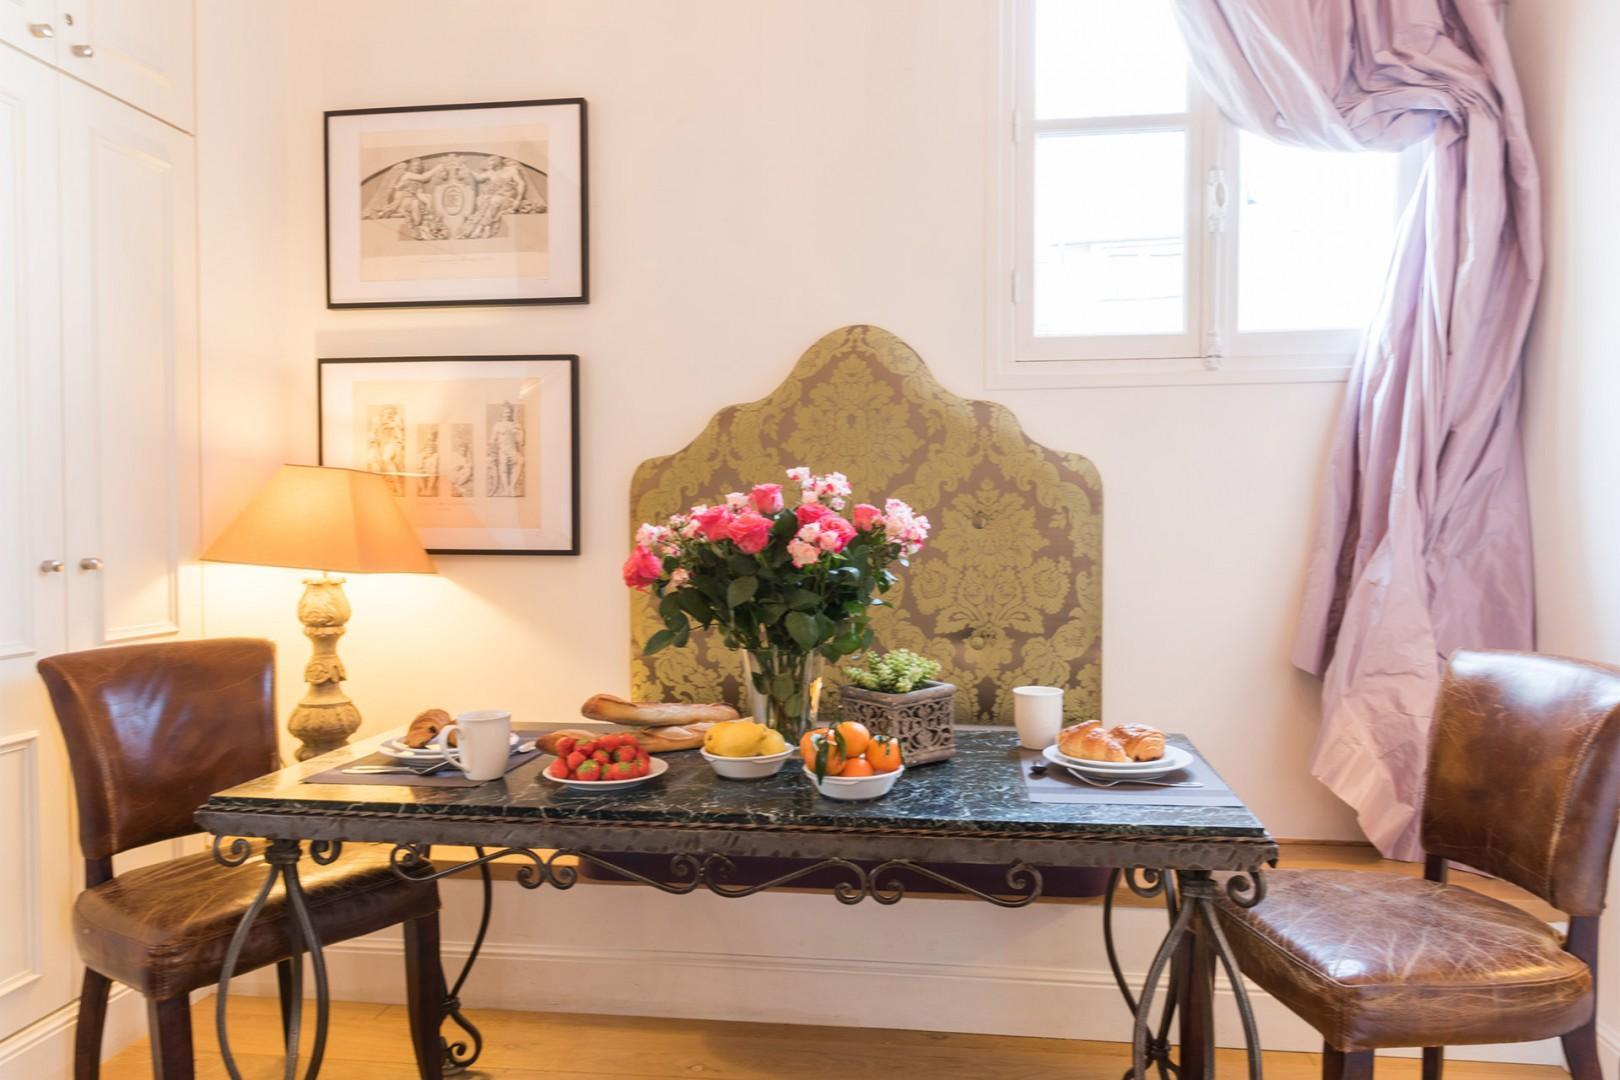 Enjoy the Venetian-style dining area.